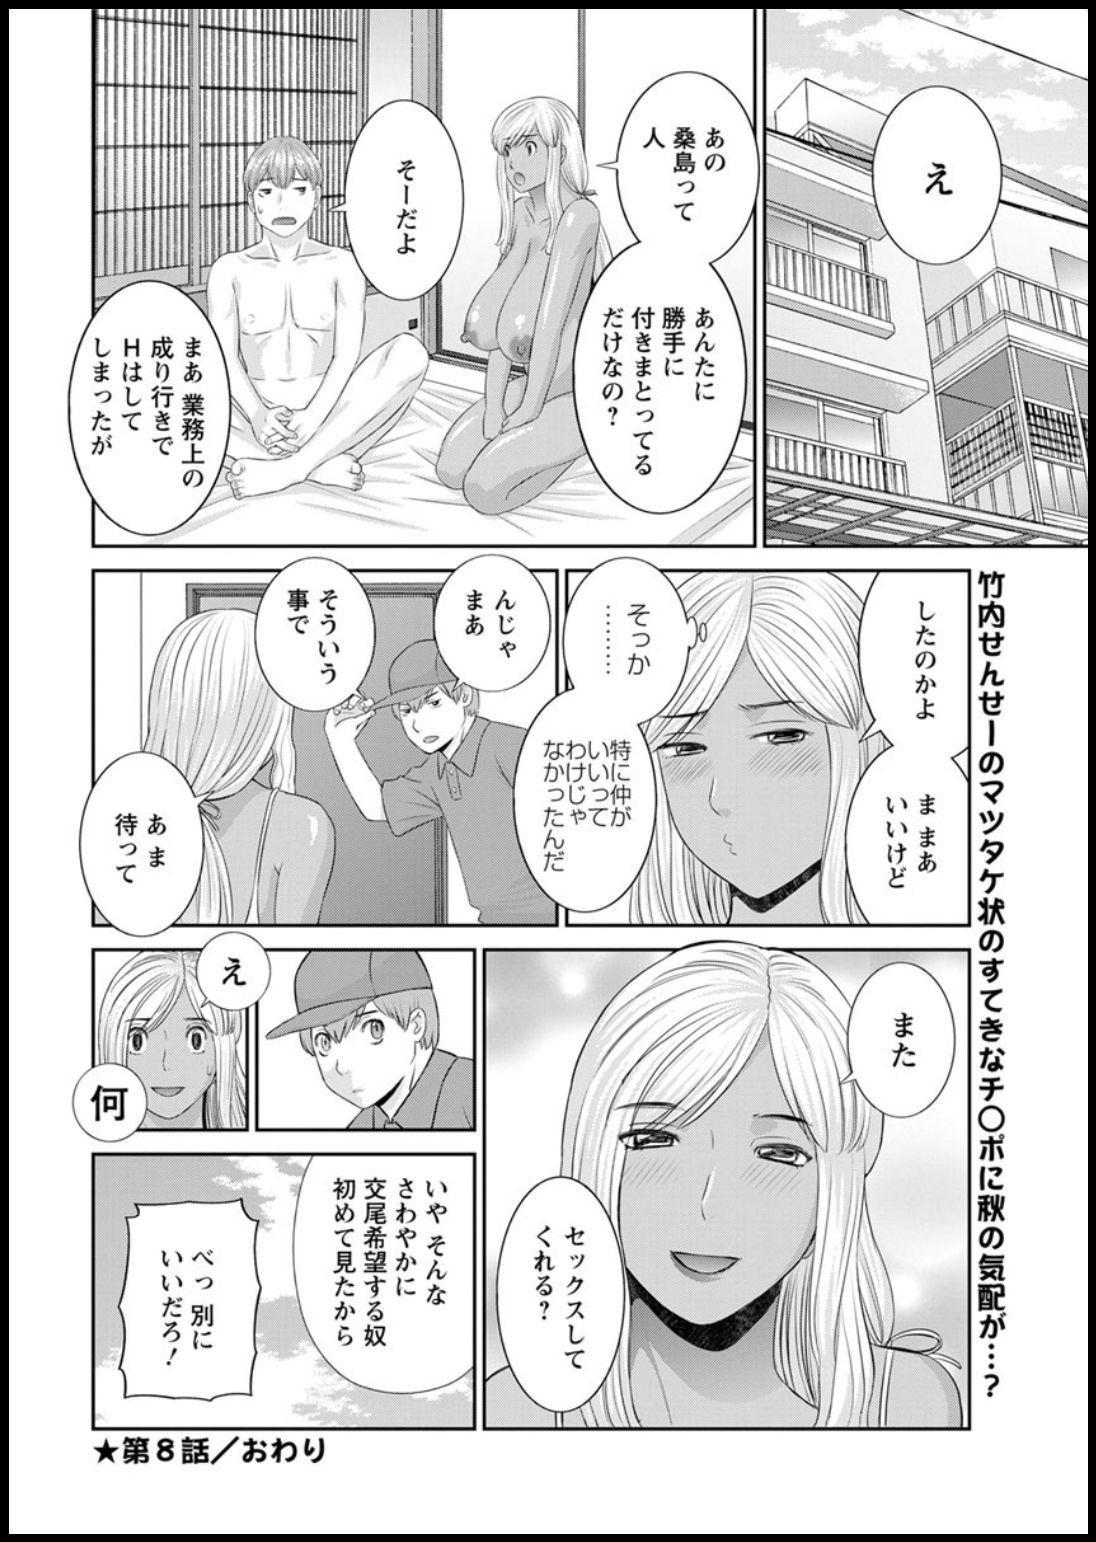 [Kawamori Misaki] Kaikan Hitotsuma Gakuen Ch. 1-6, 8-16 [Digital] 129